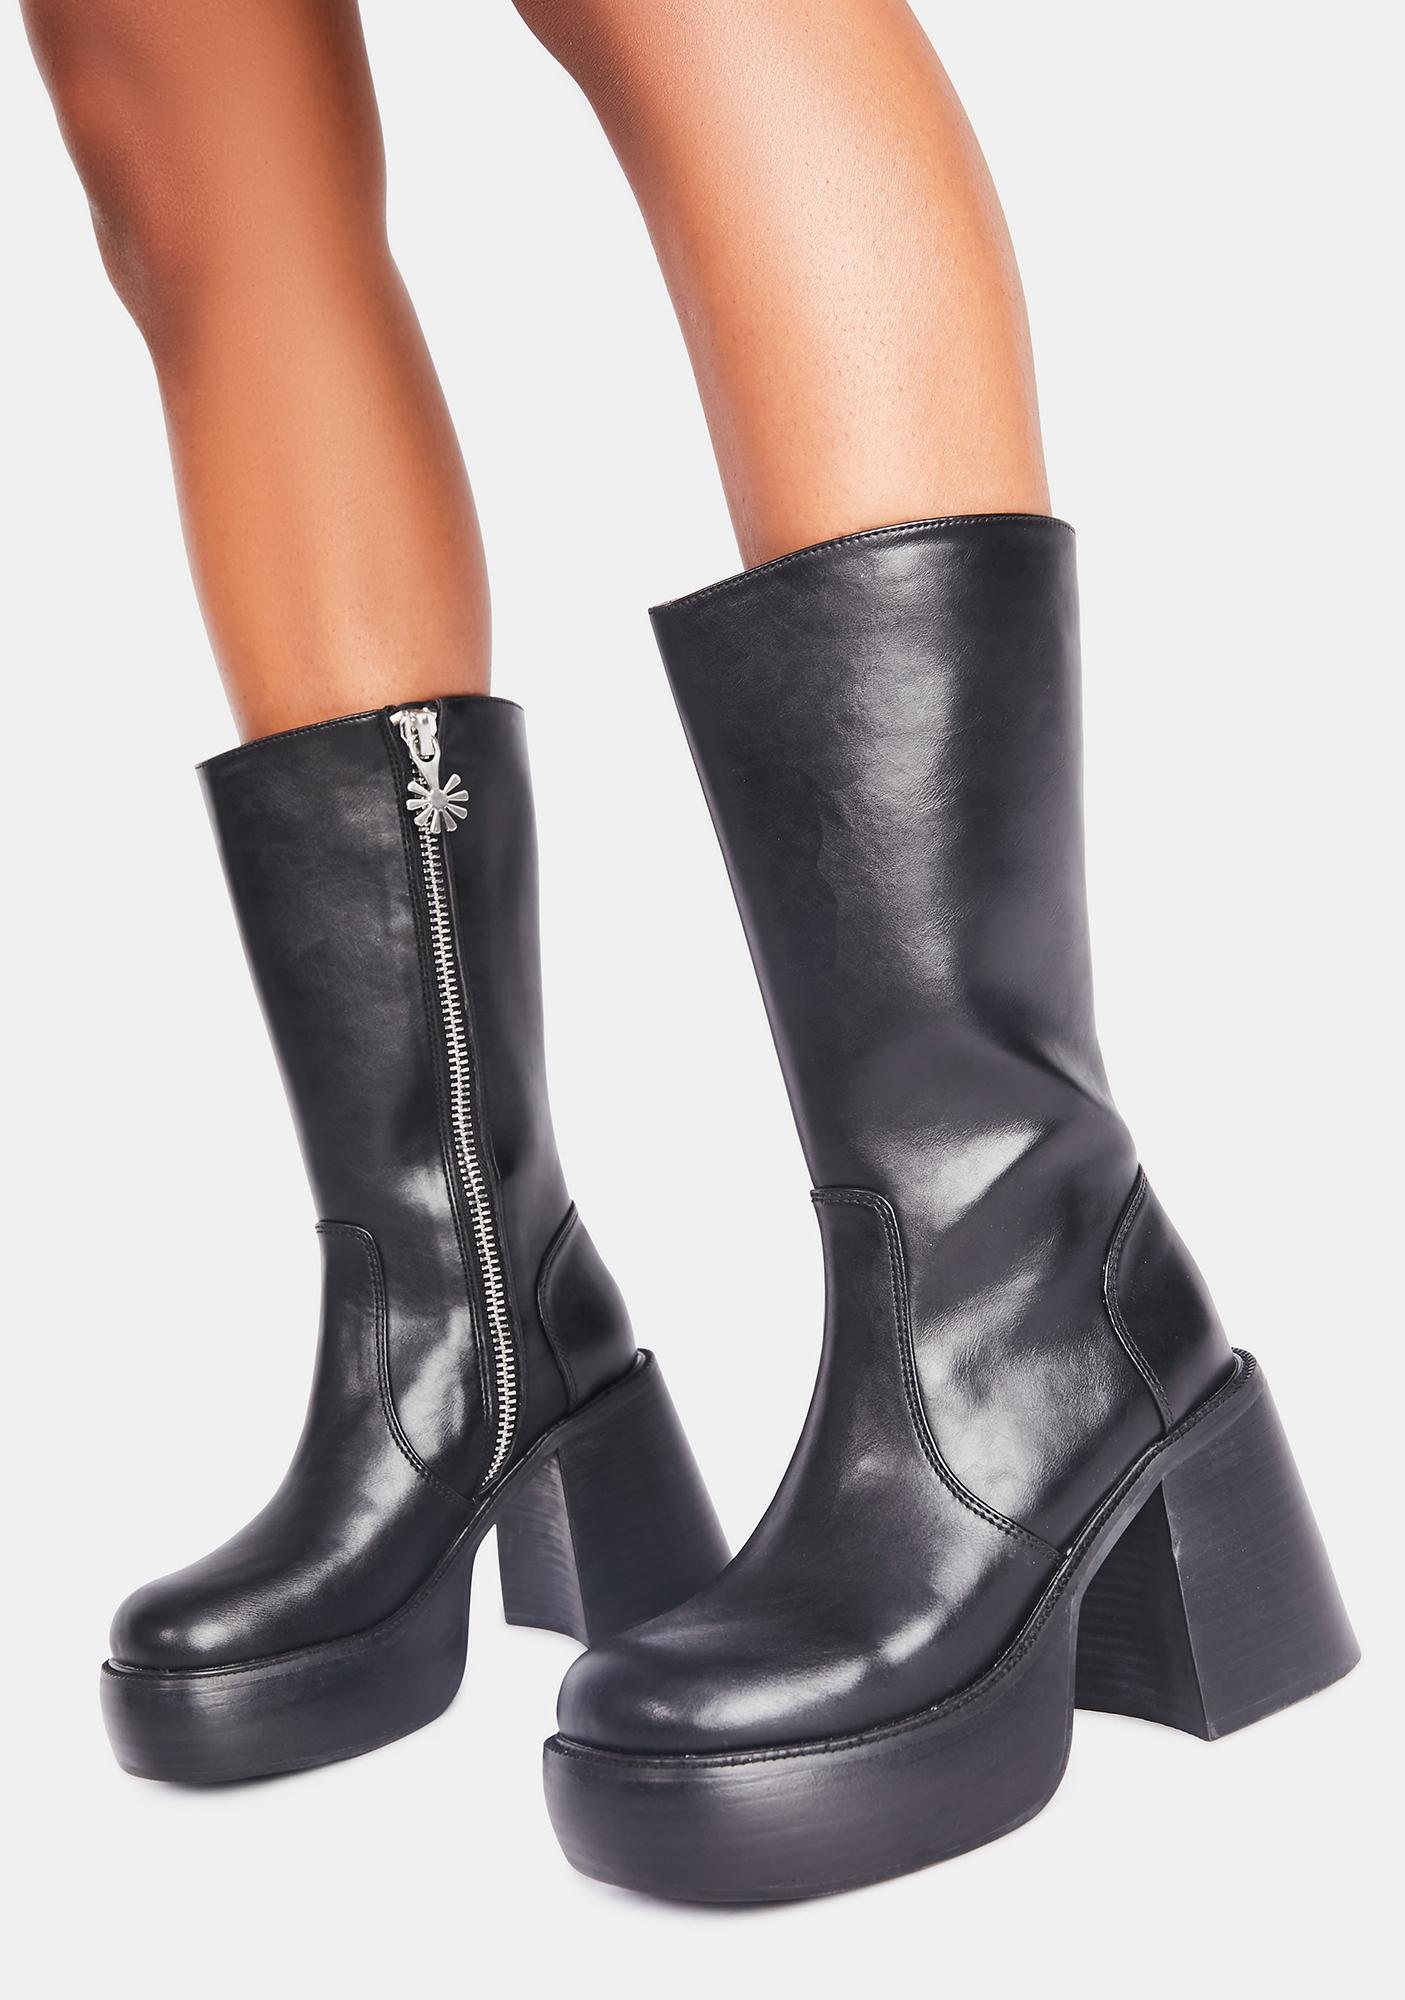 dELiA*s by Dolls Kill New Moon Mischief Knee High Boots